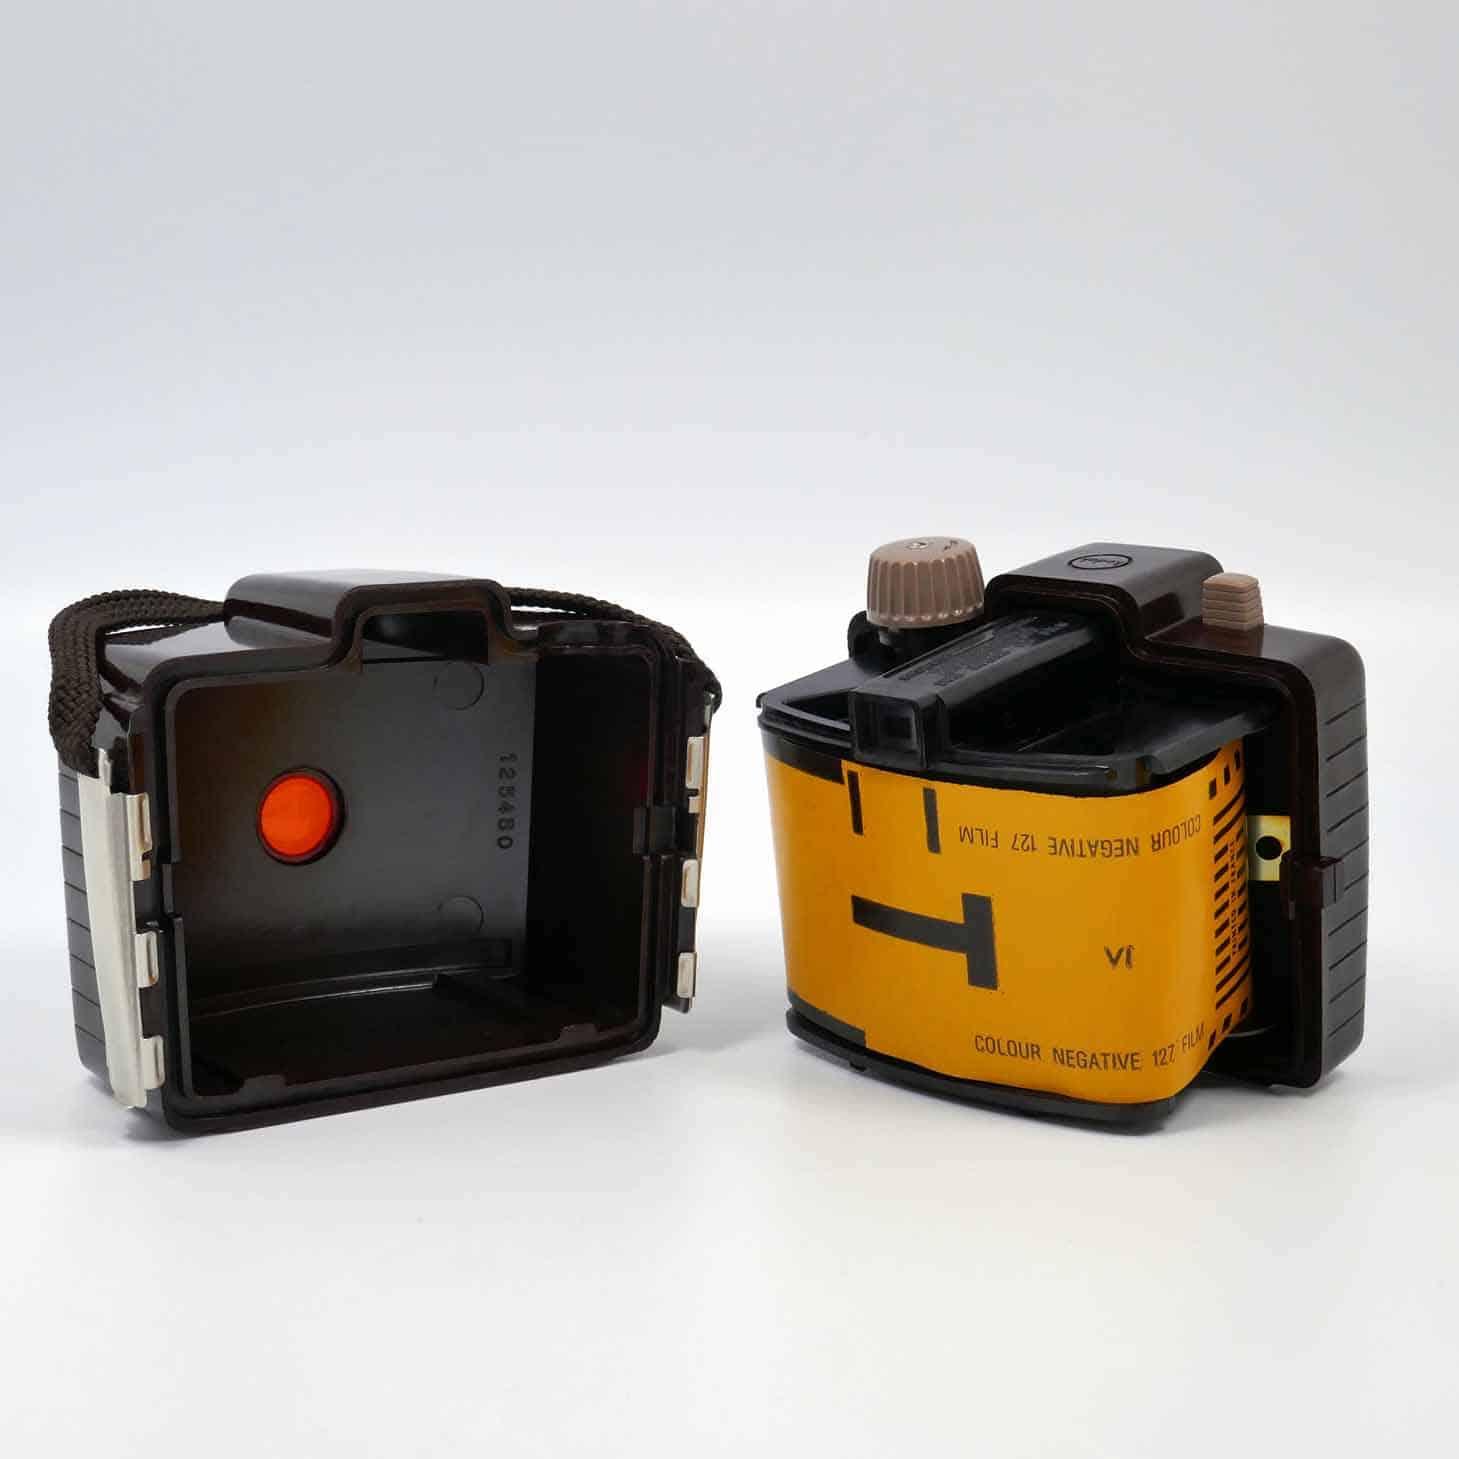 clean-cameras-Kodak-Box-Brownie-Chiquita-03